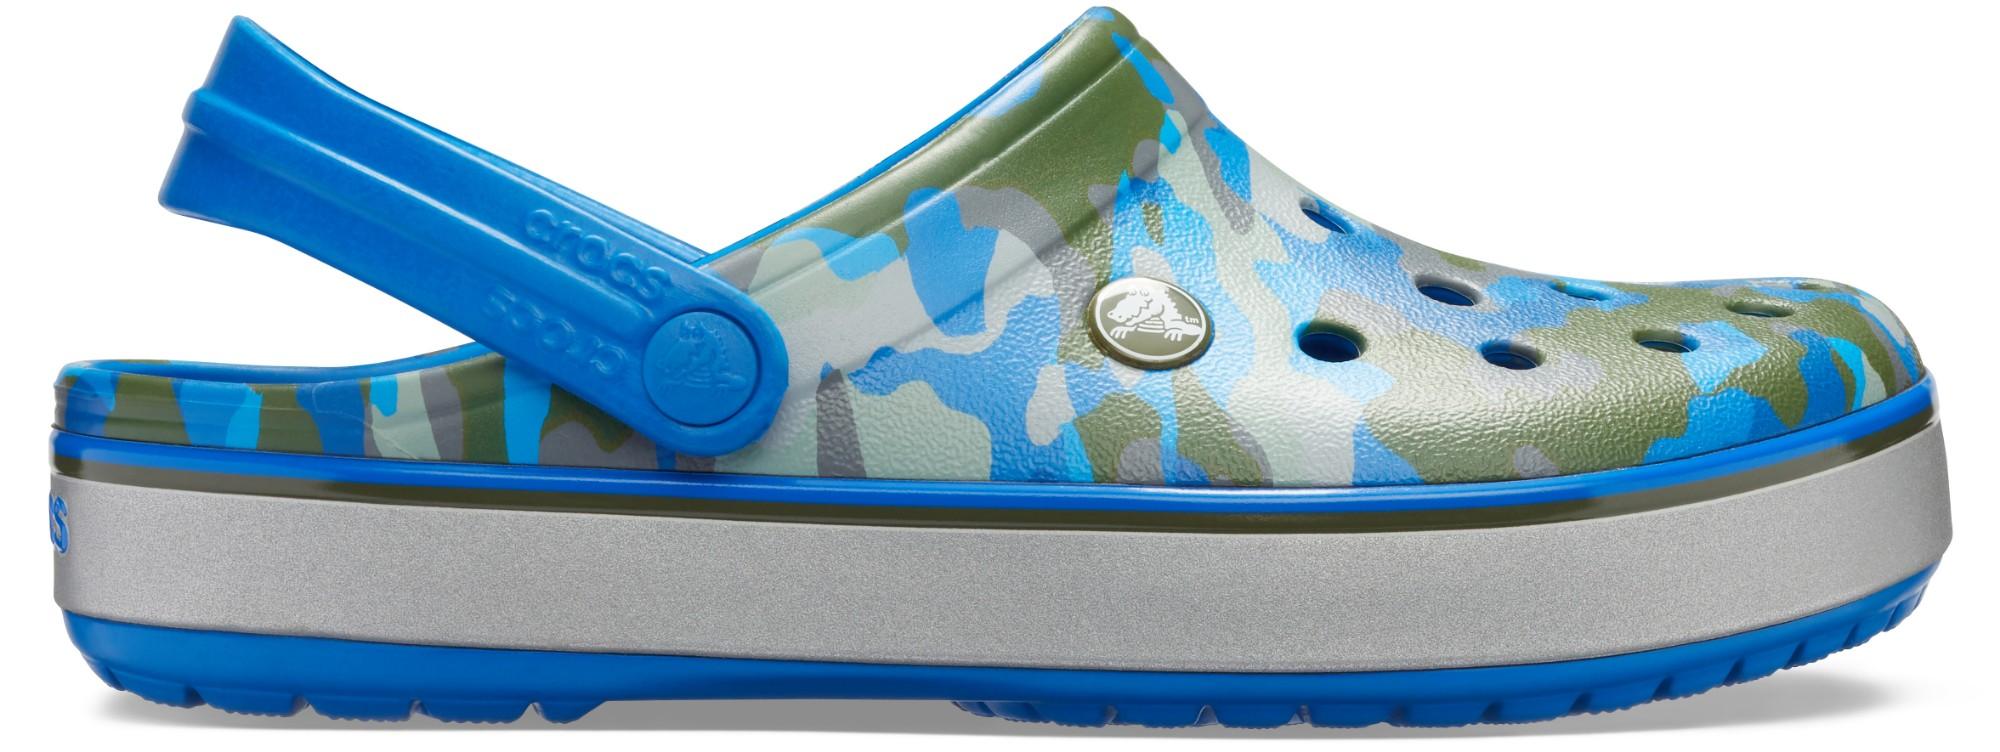 Crocs™ Crocband Printed Clog Bright Cobalt/Army Green 41